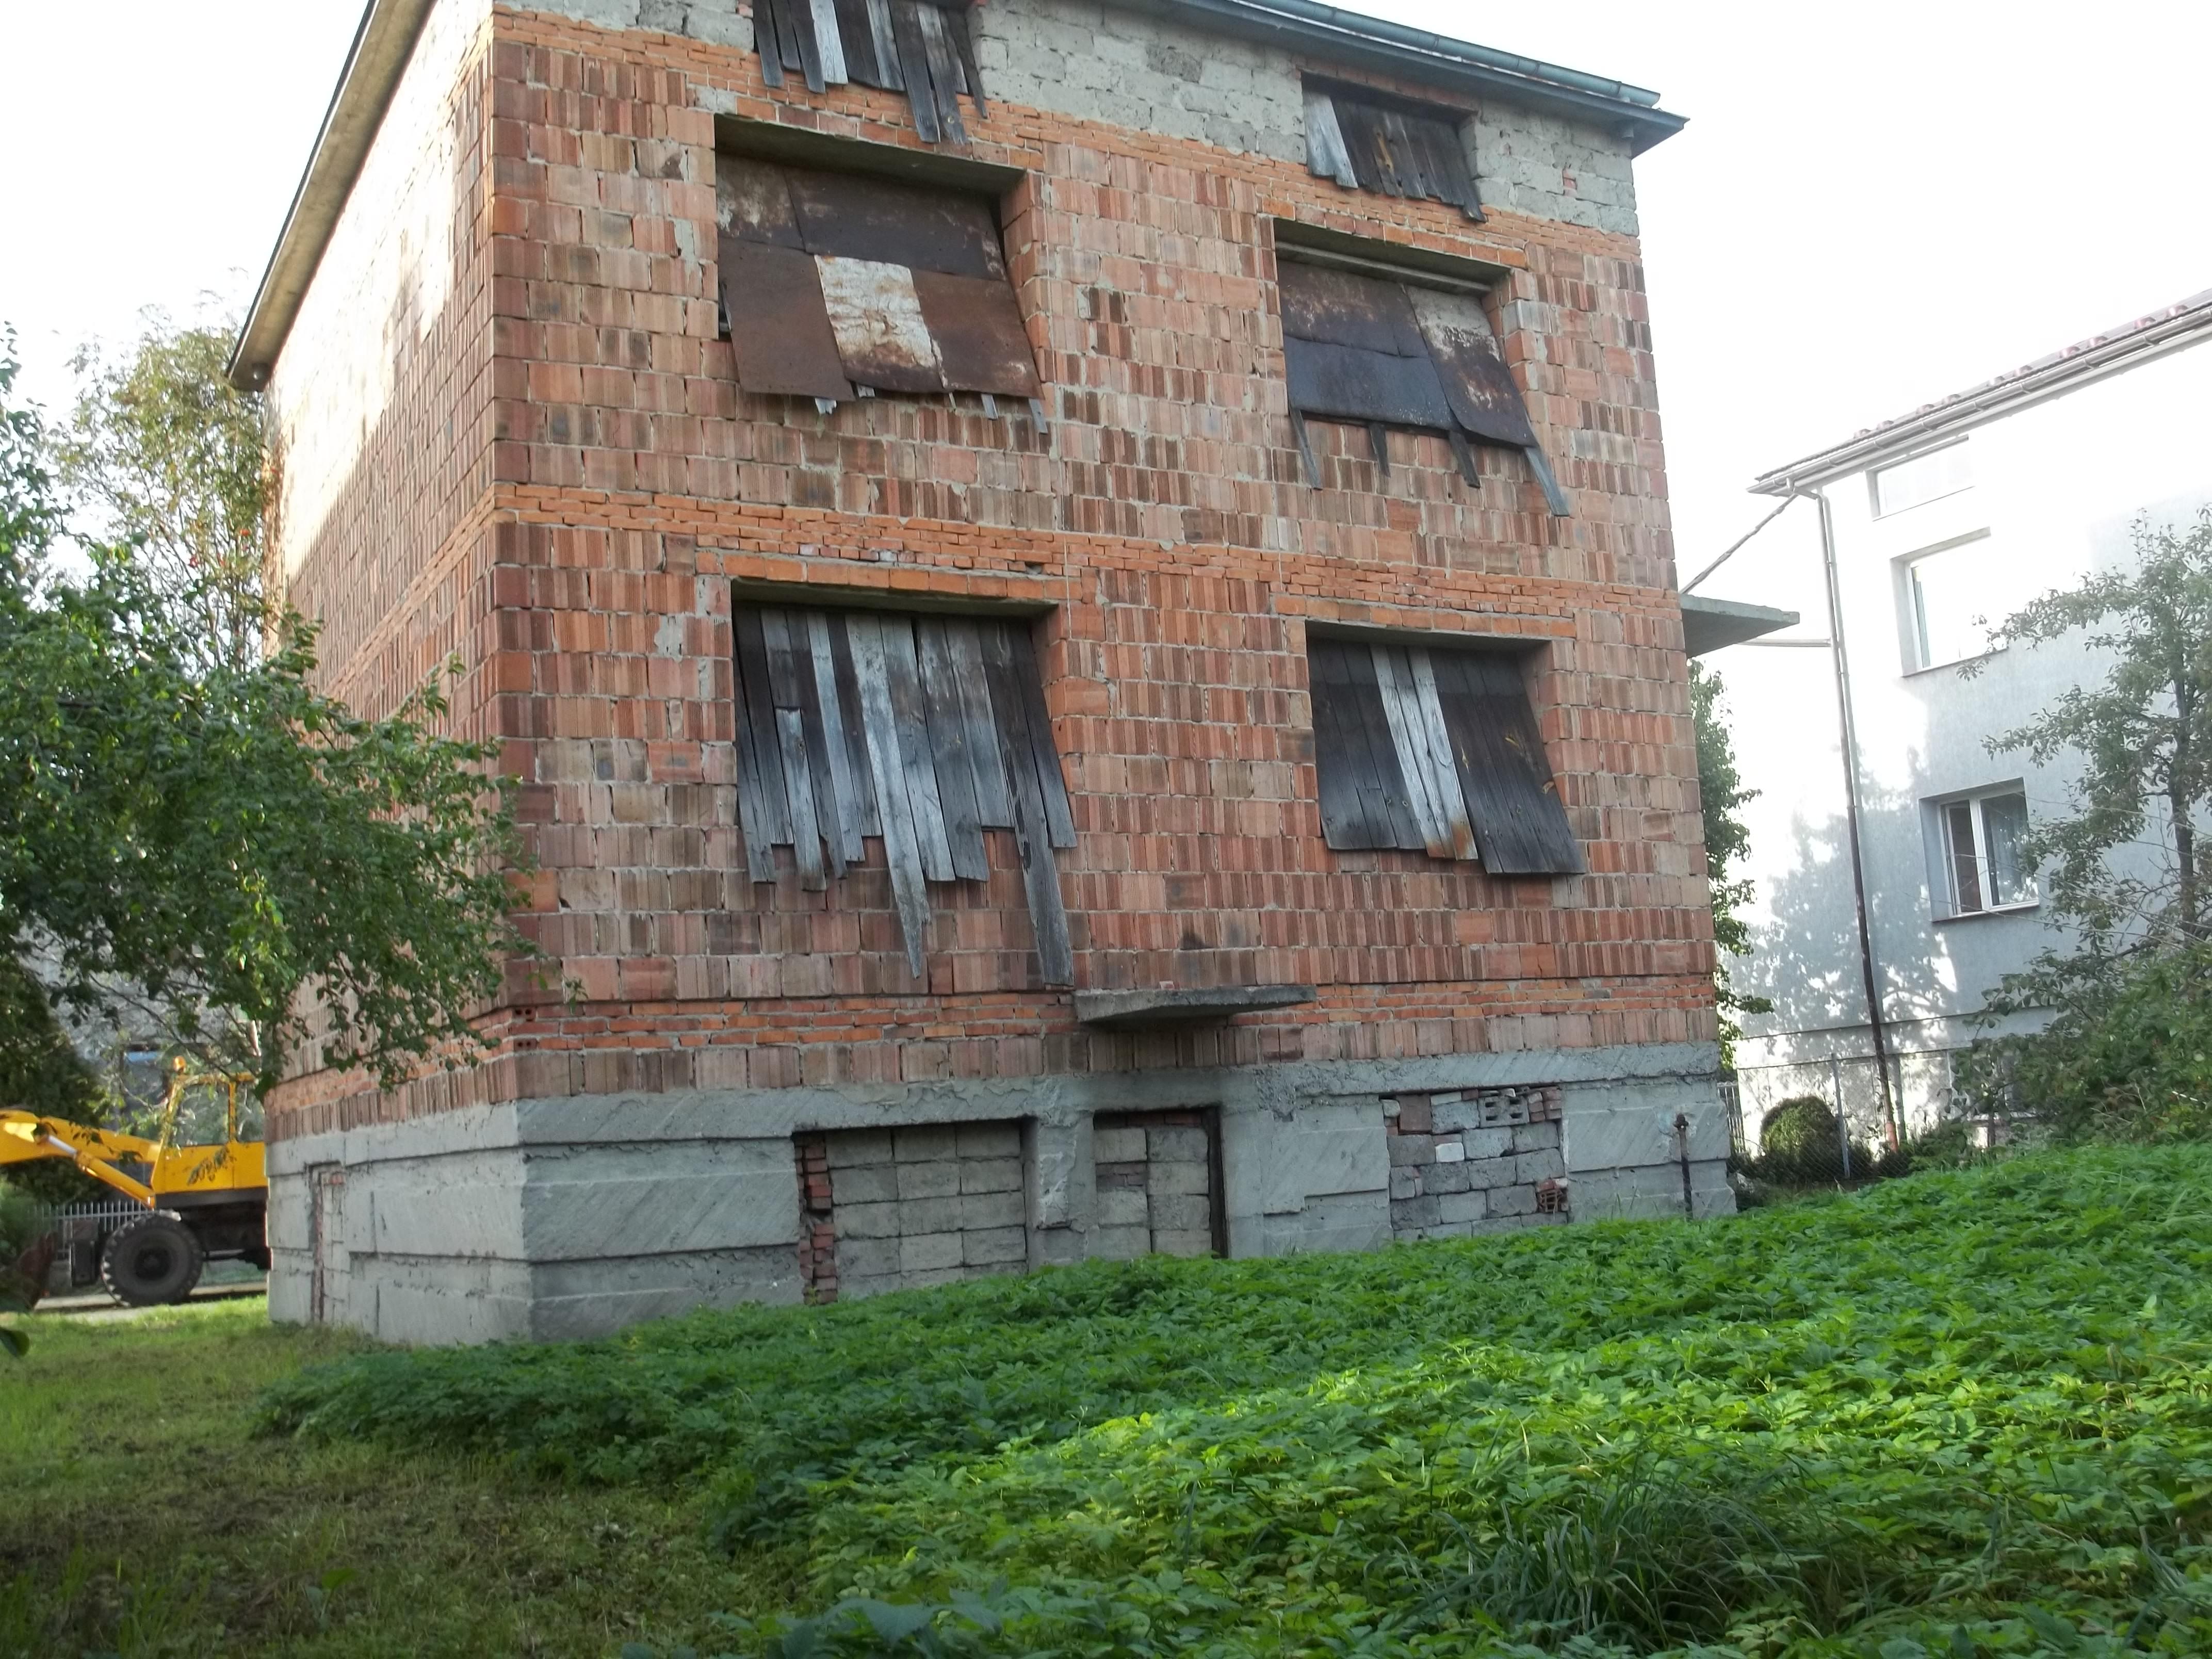 vendita casa indipendente lubaczow podkarpackie polonia